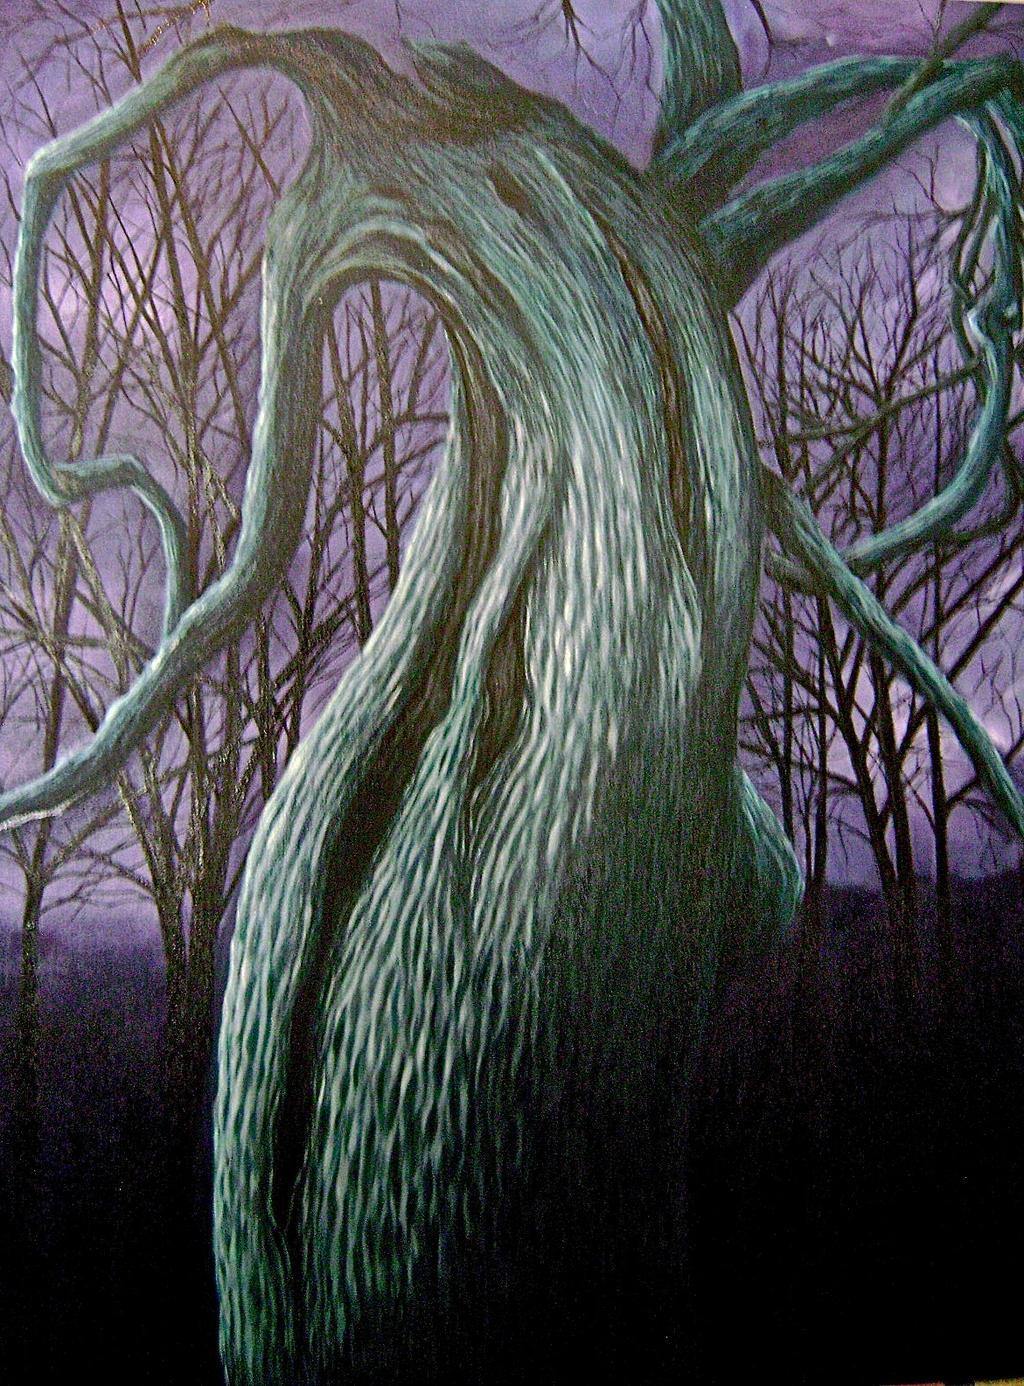 Night Tree by tiletable